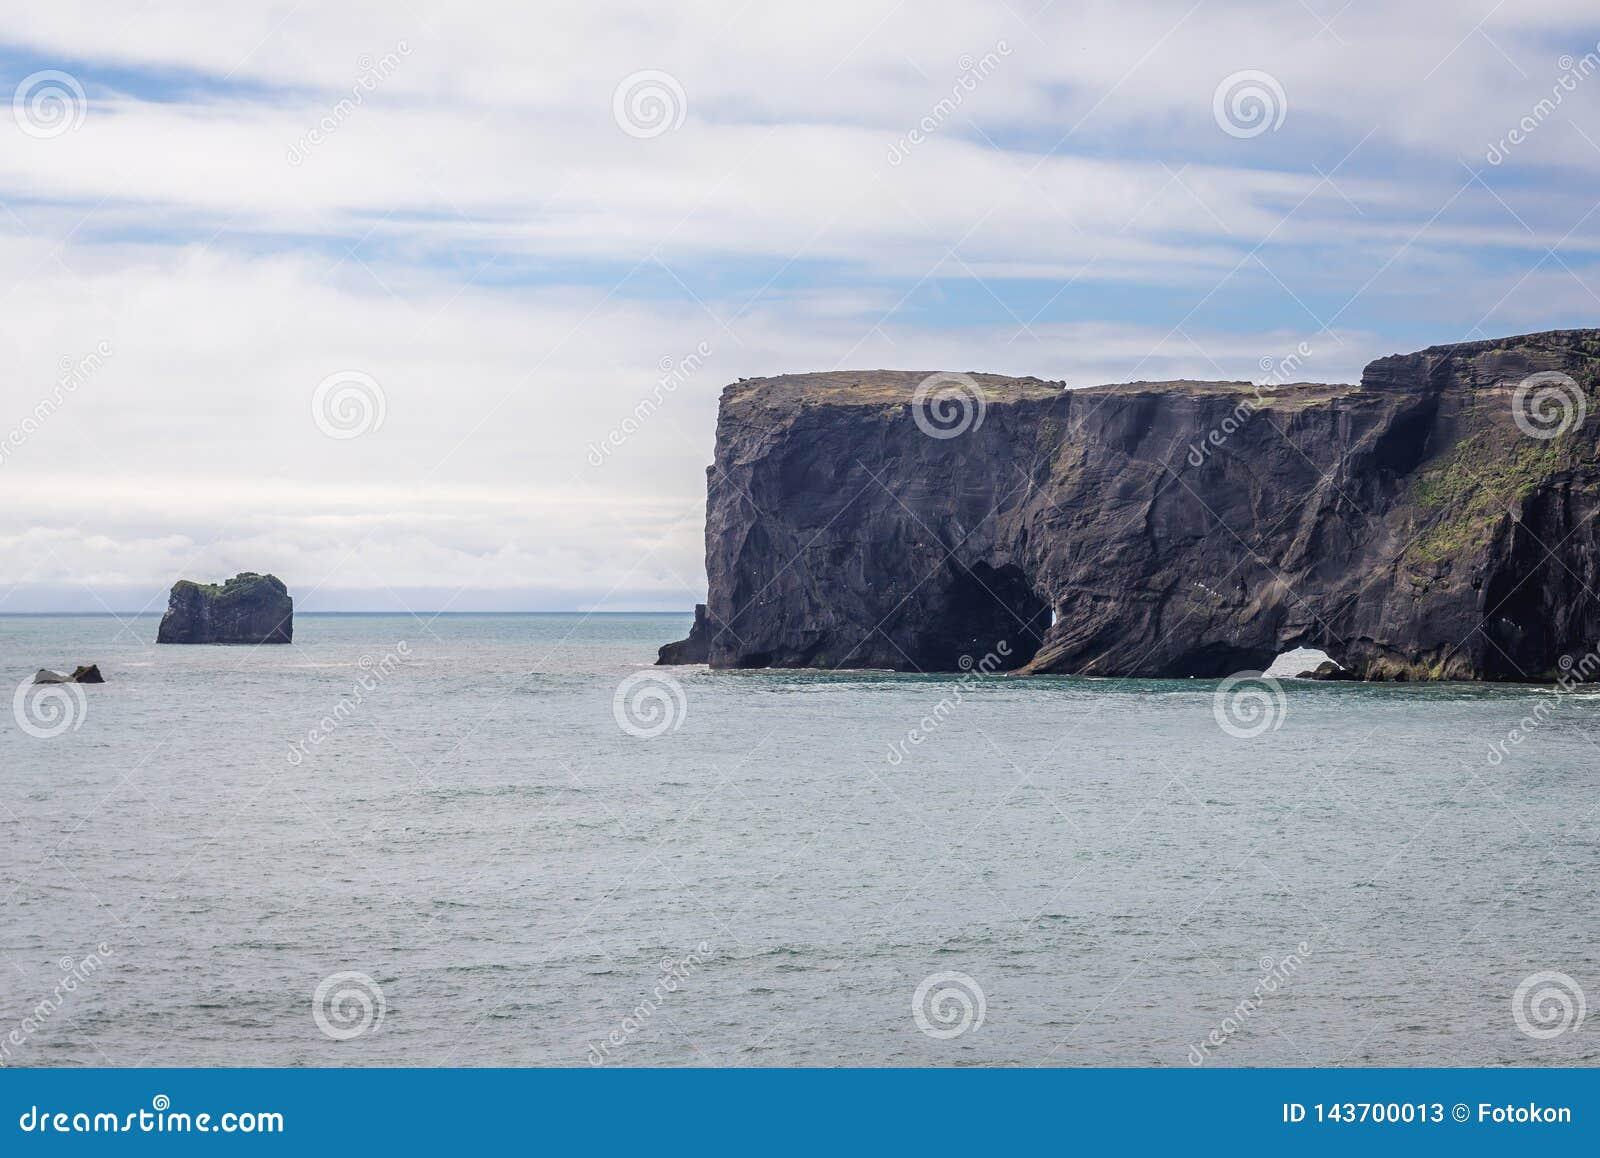 Cape Dyrholaey in Iceland